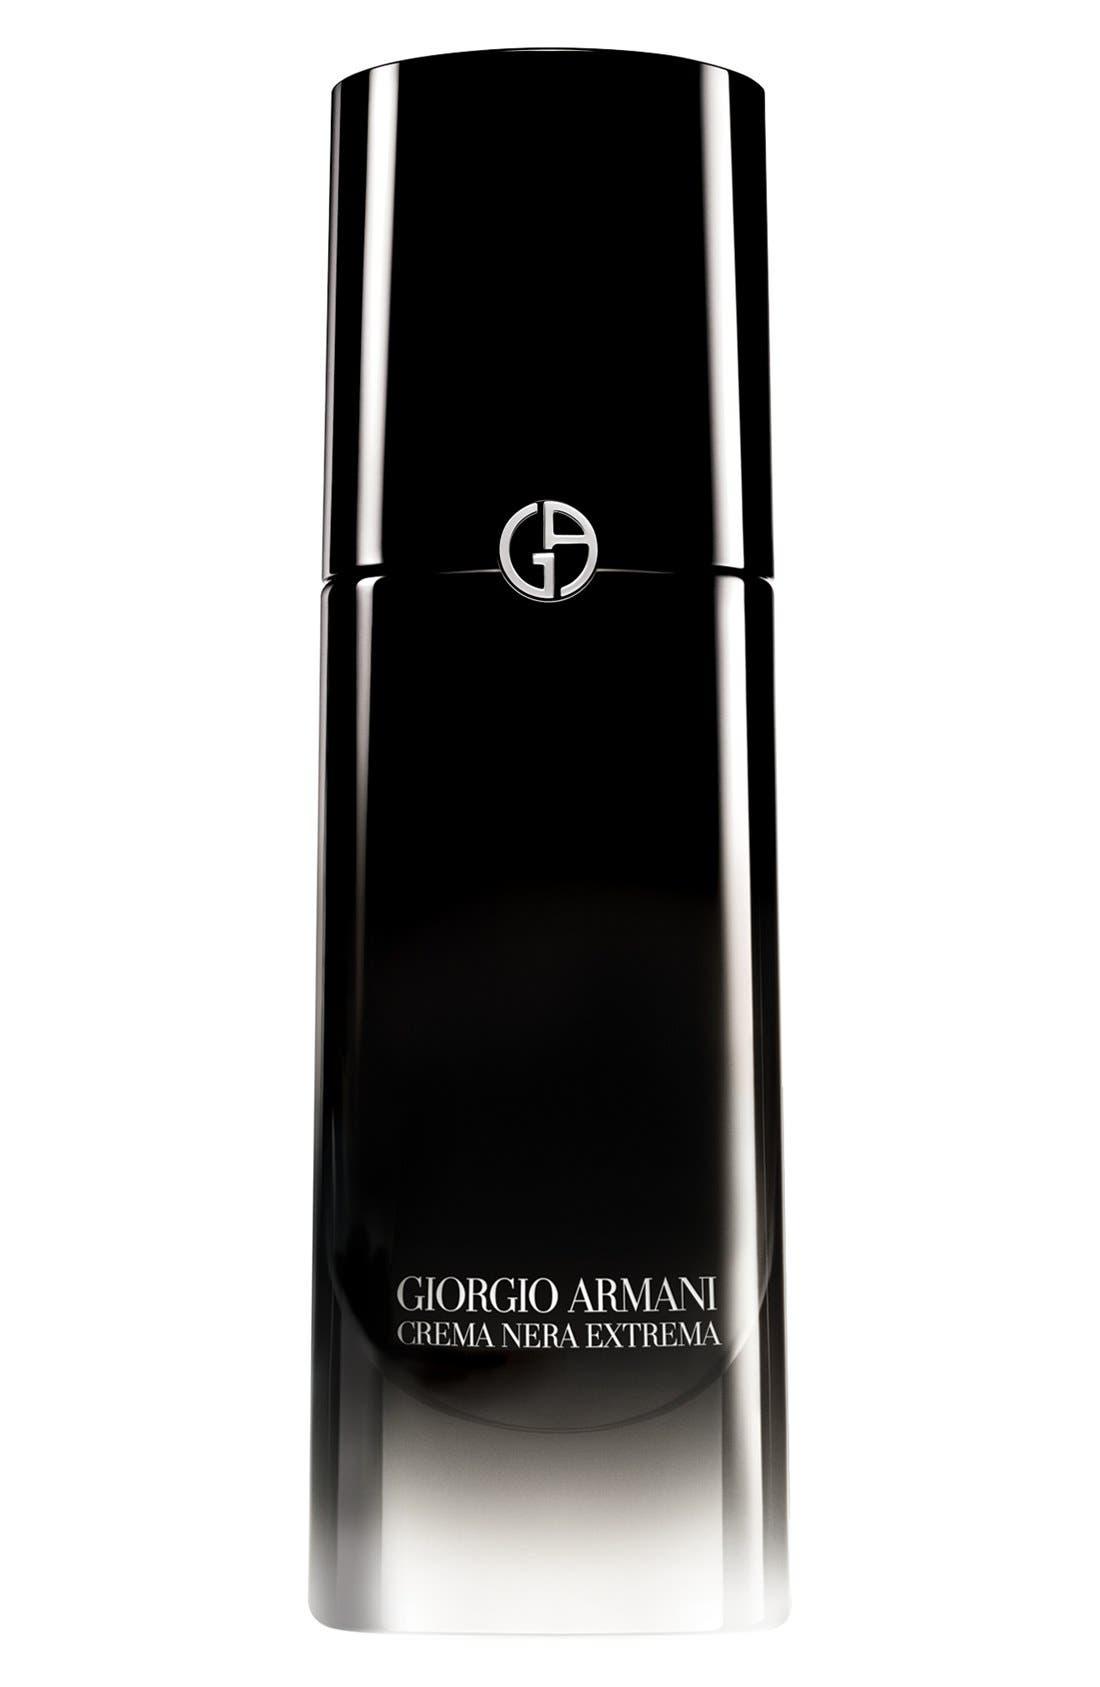 Giorgio Armani 'Crema Nera Extrema' Face Serum